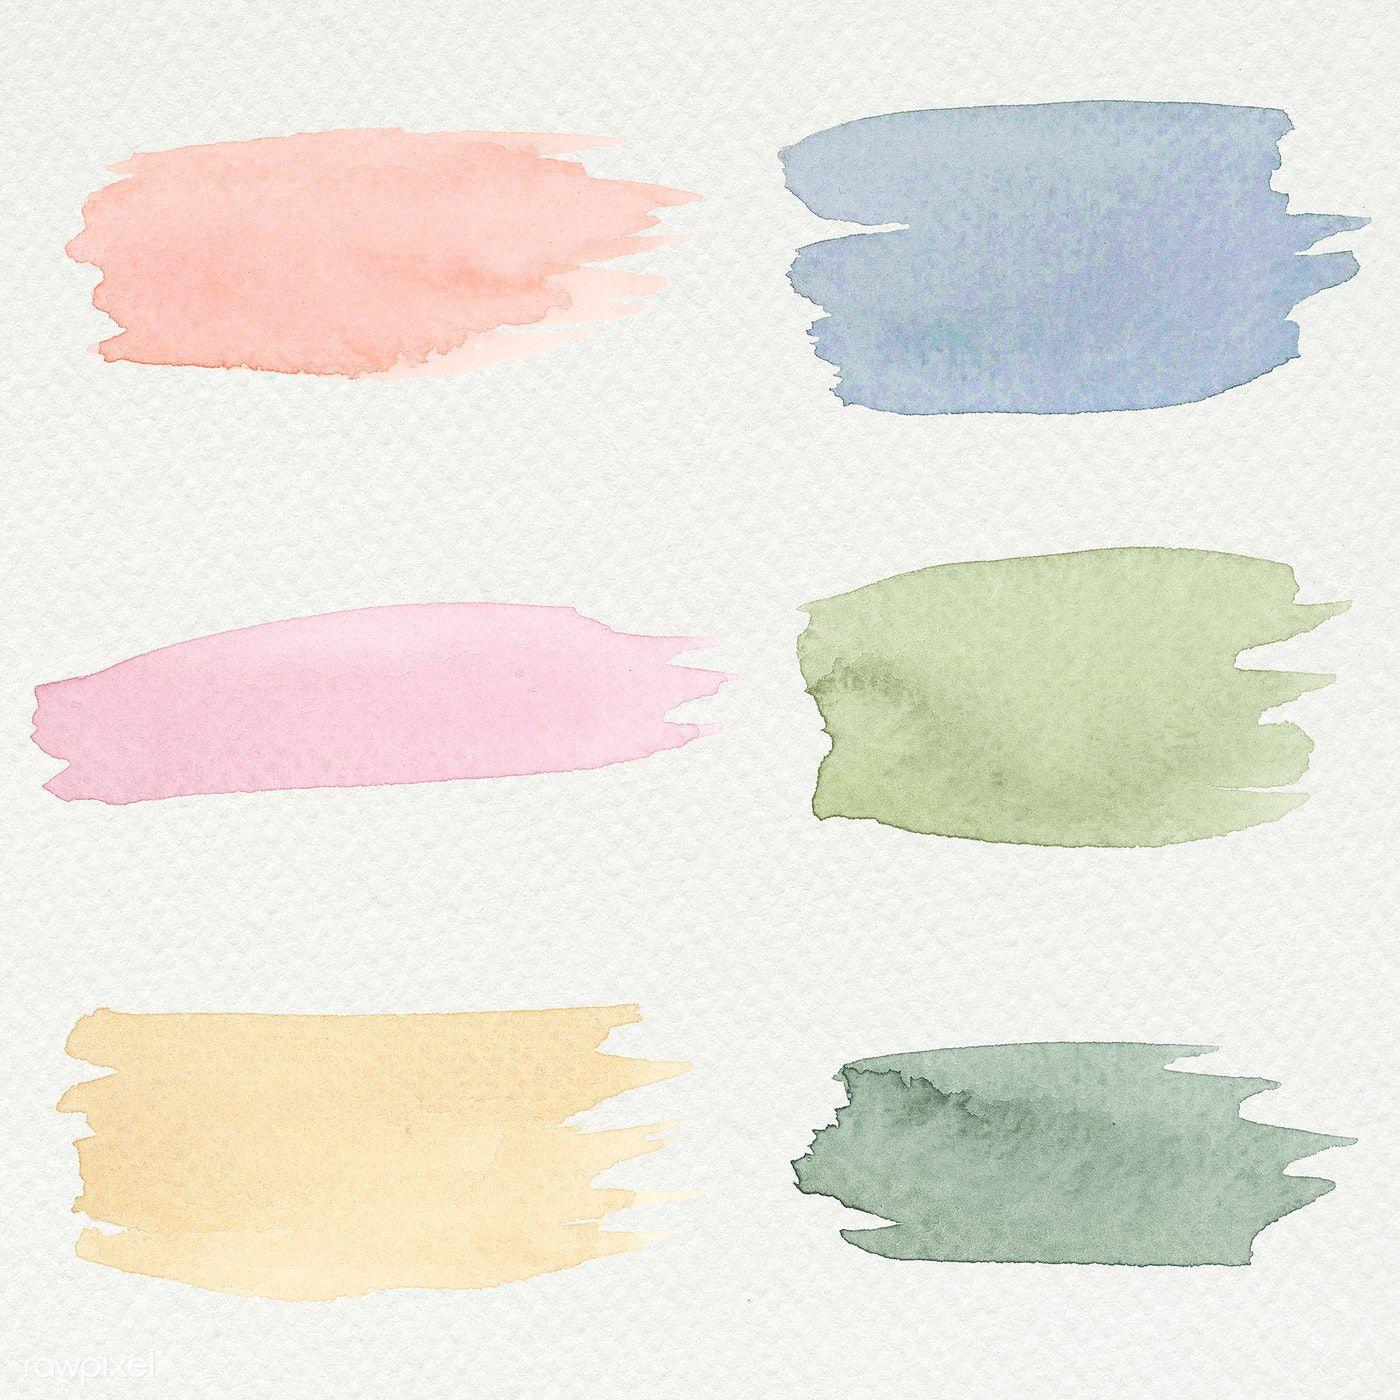 Download Premium Illustration Of Colorful Watercolor Brush Strokes In 2020 Watercolor Brushes Watercolor Splash Png Watercolor Splash